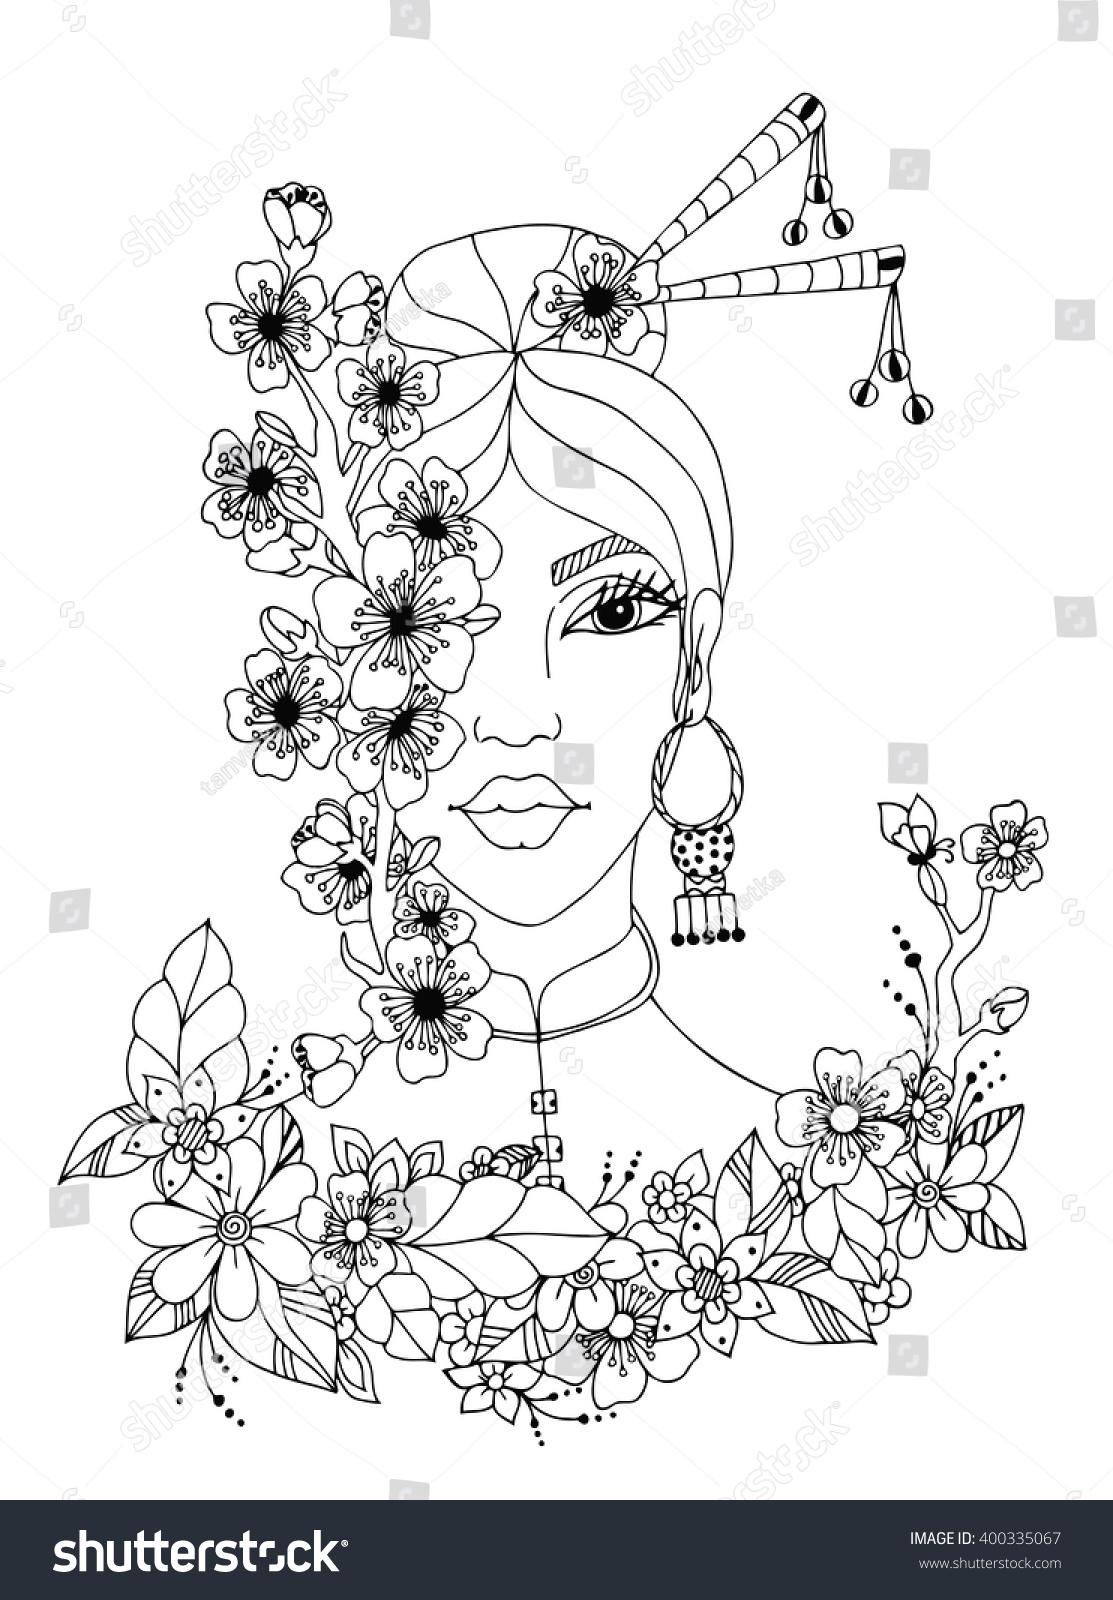 Vector Illustration Zentangl Portrait Of Japanese Women Doodle Flowers Sakura Frame Spring